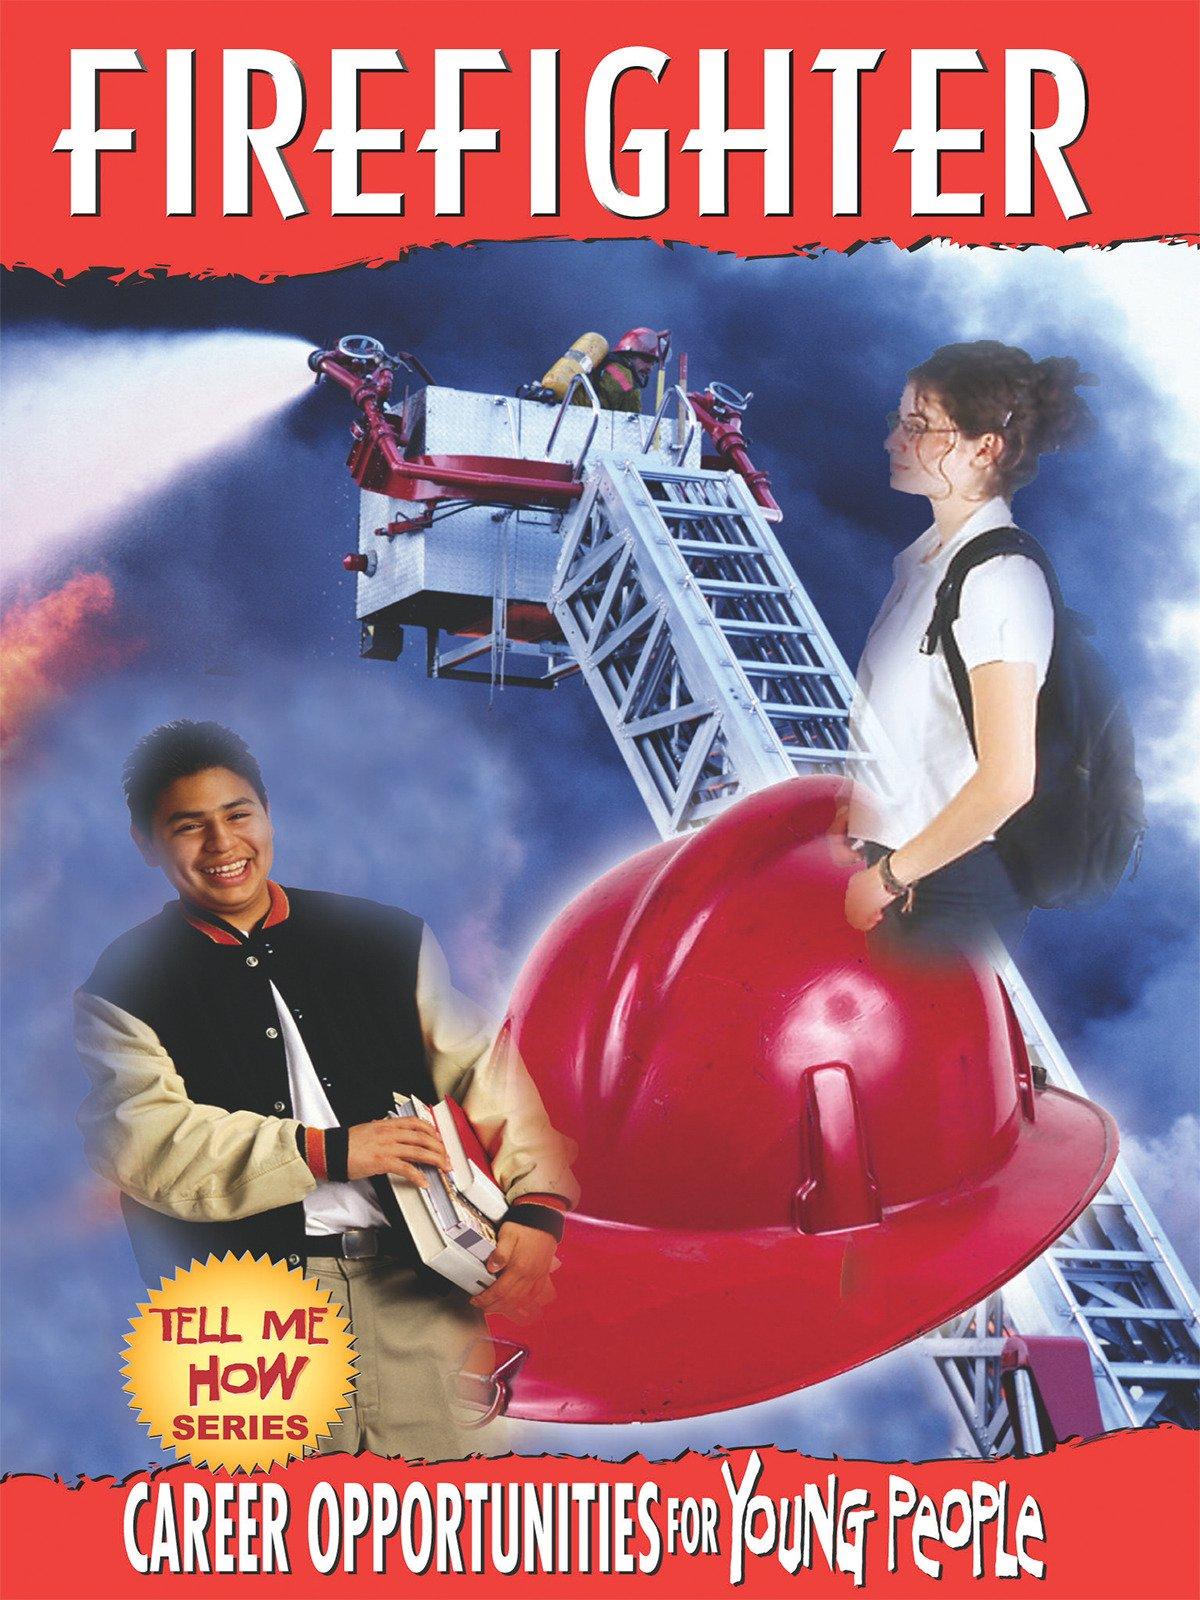 Tell Me How Career Series: Firefighter